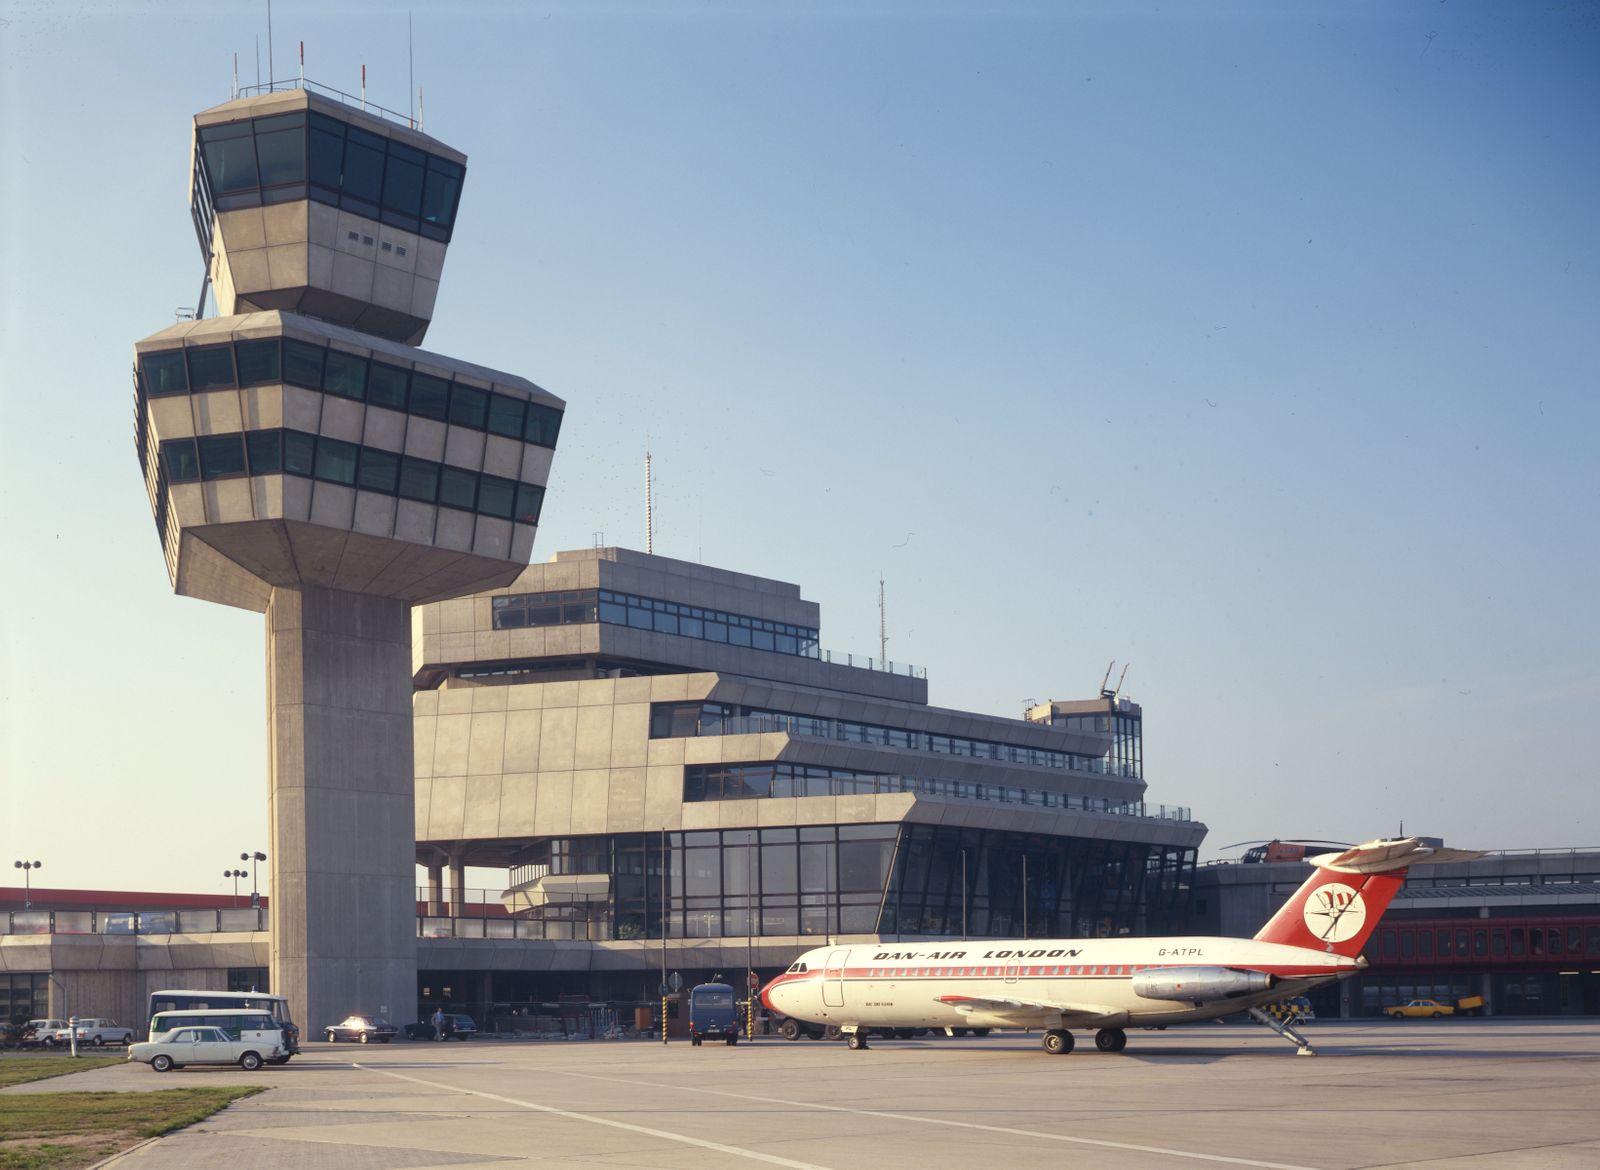 BUCH TXL. Berlin Tegel Airport / Drive to Your Gate / Seite 50-31, Bild 39